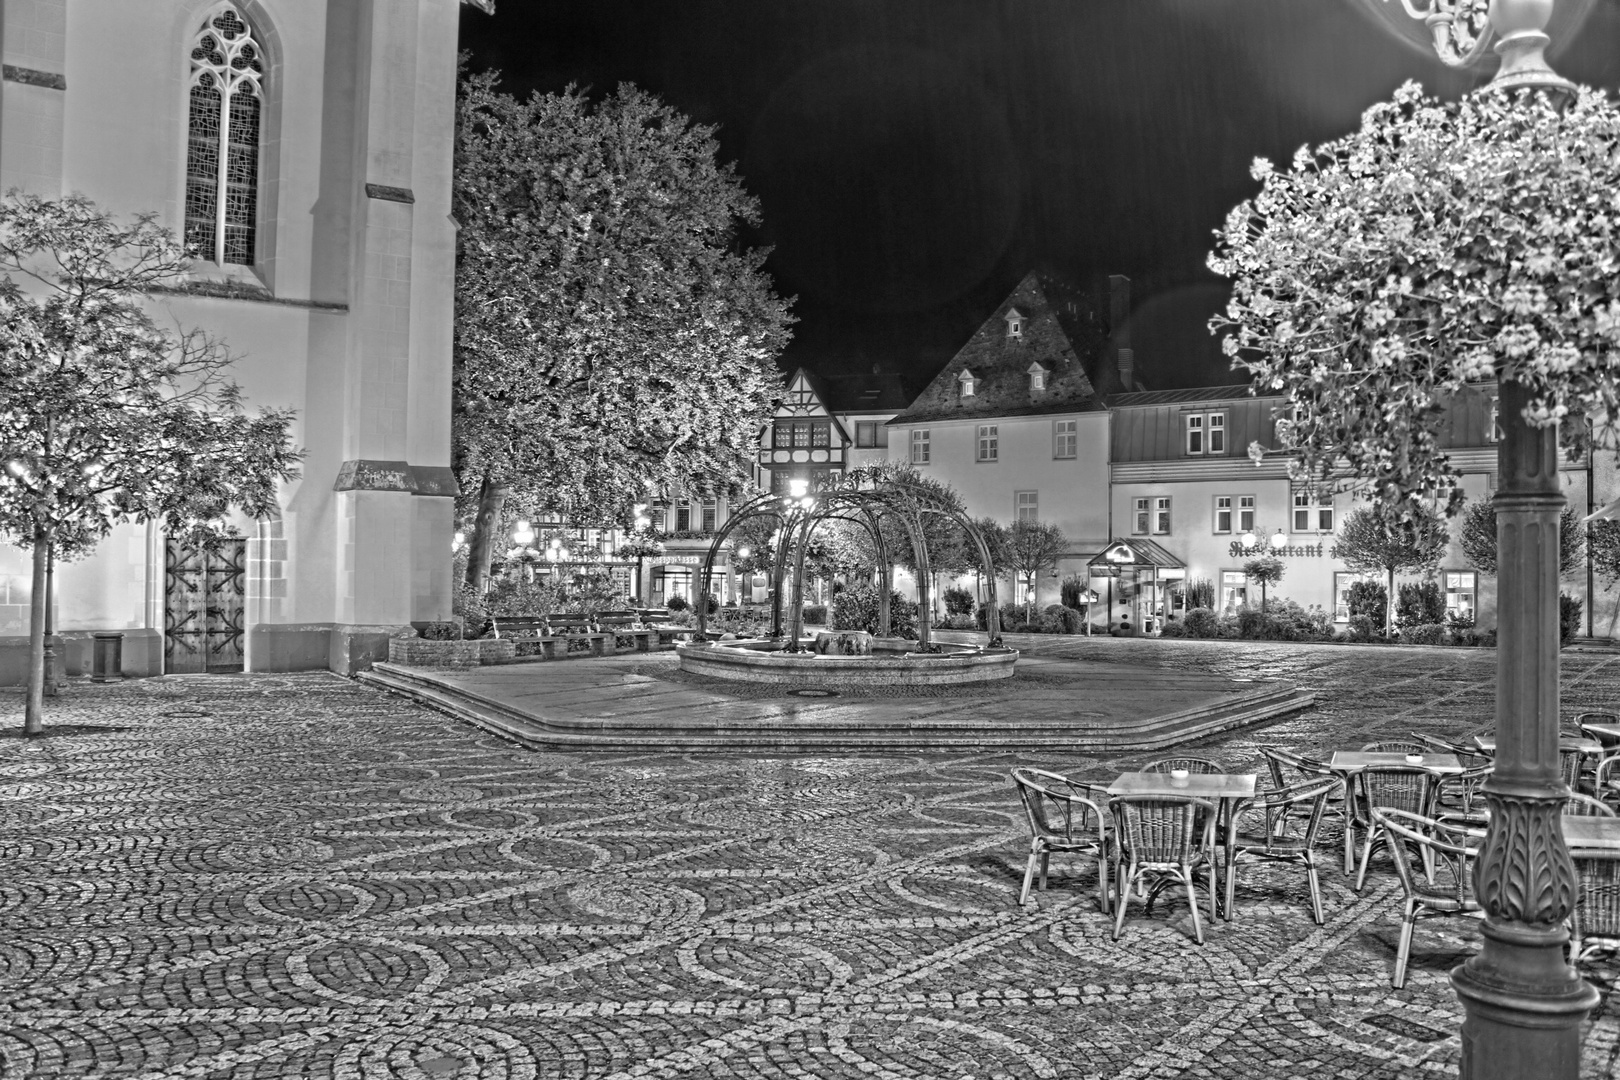 Ahrweiler Markt